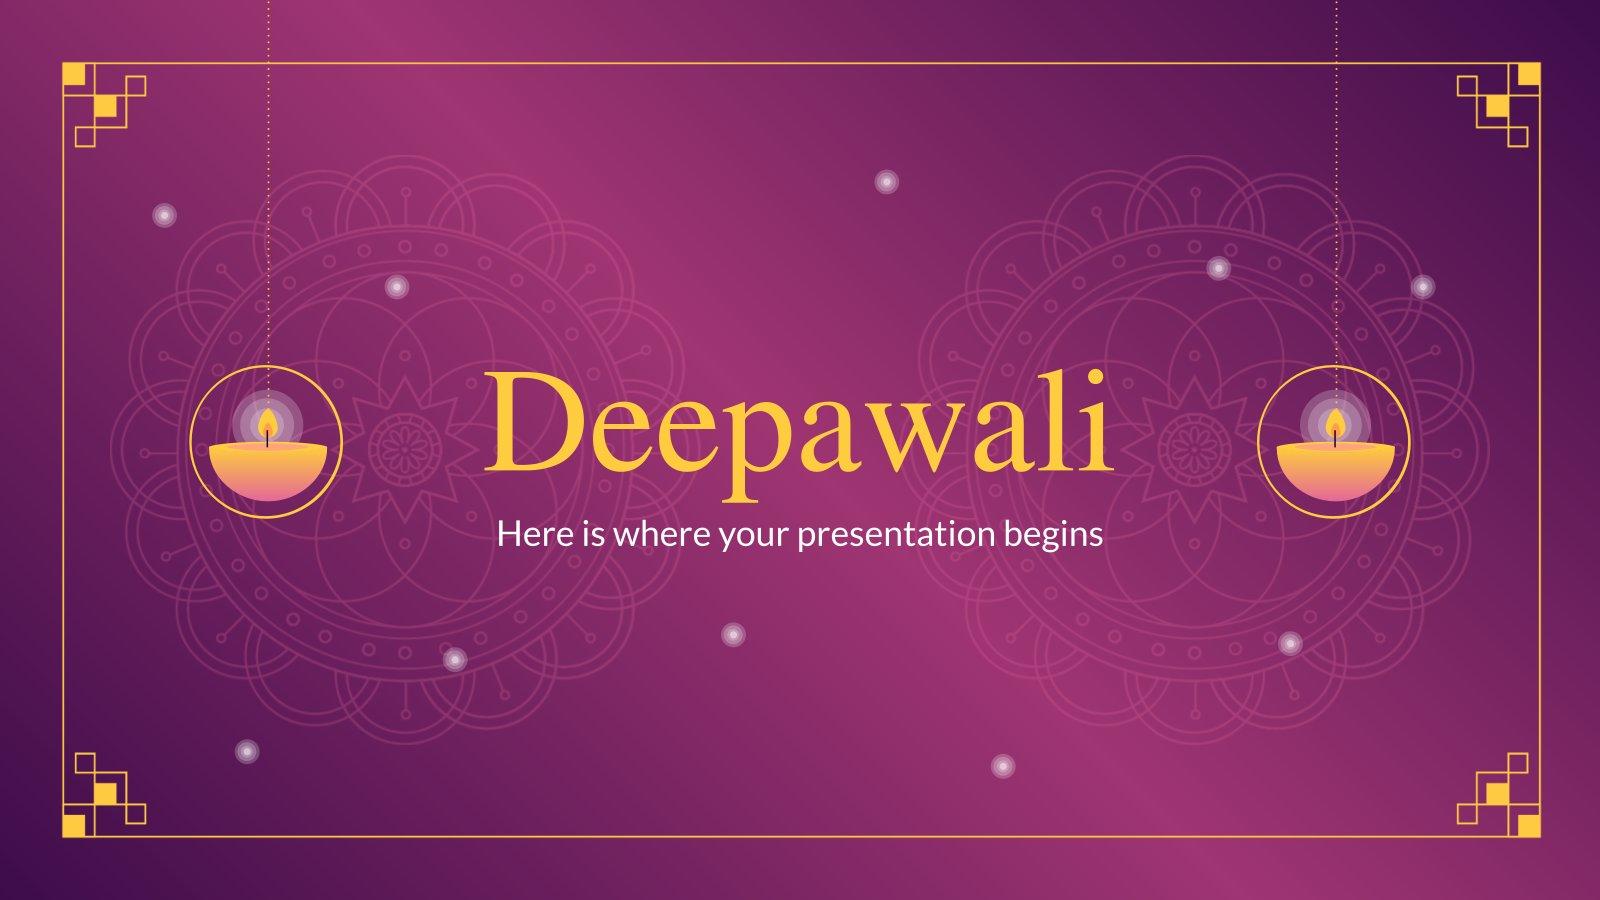 Deepawali presentation template